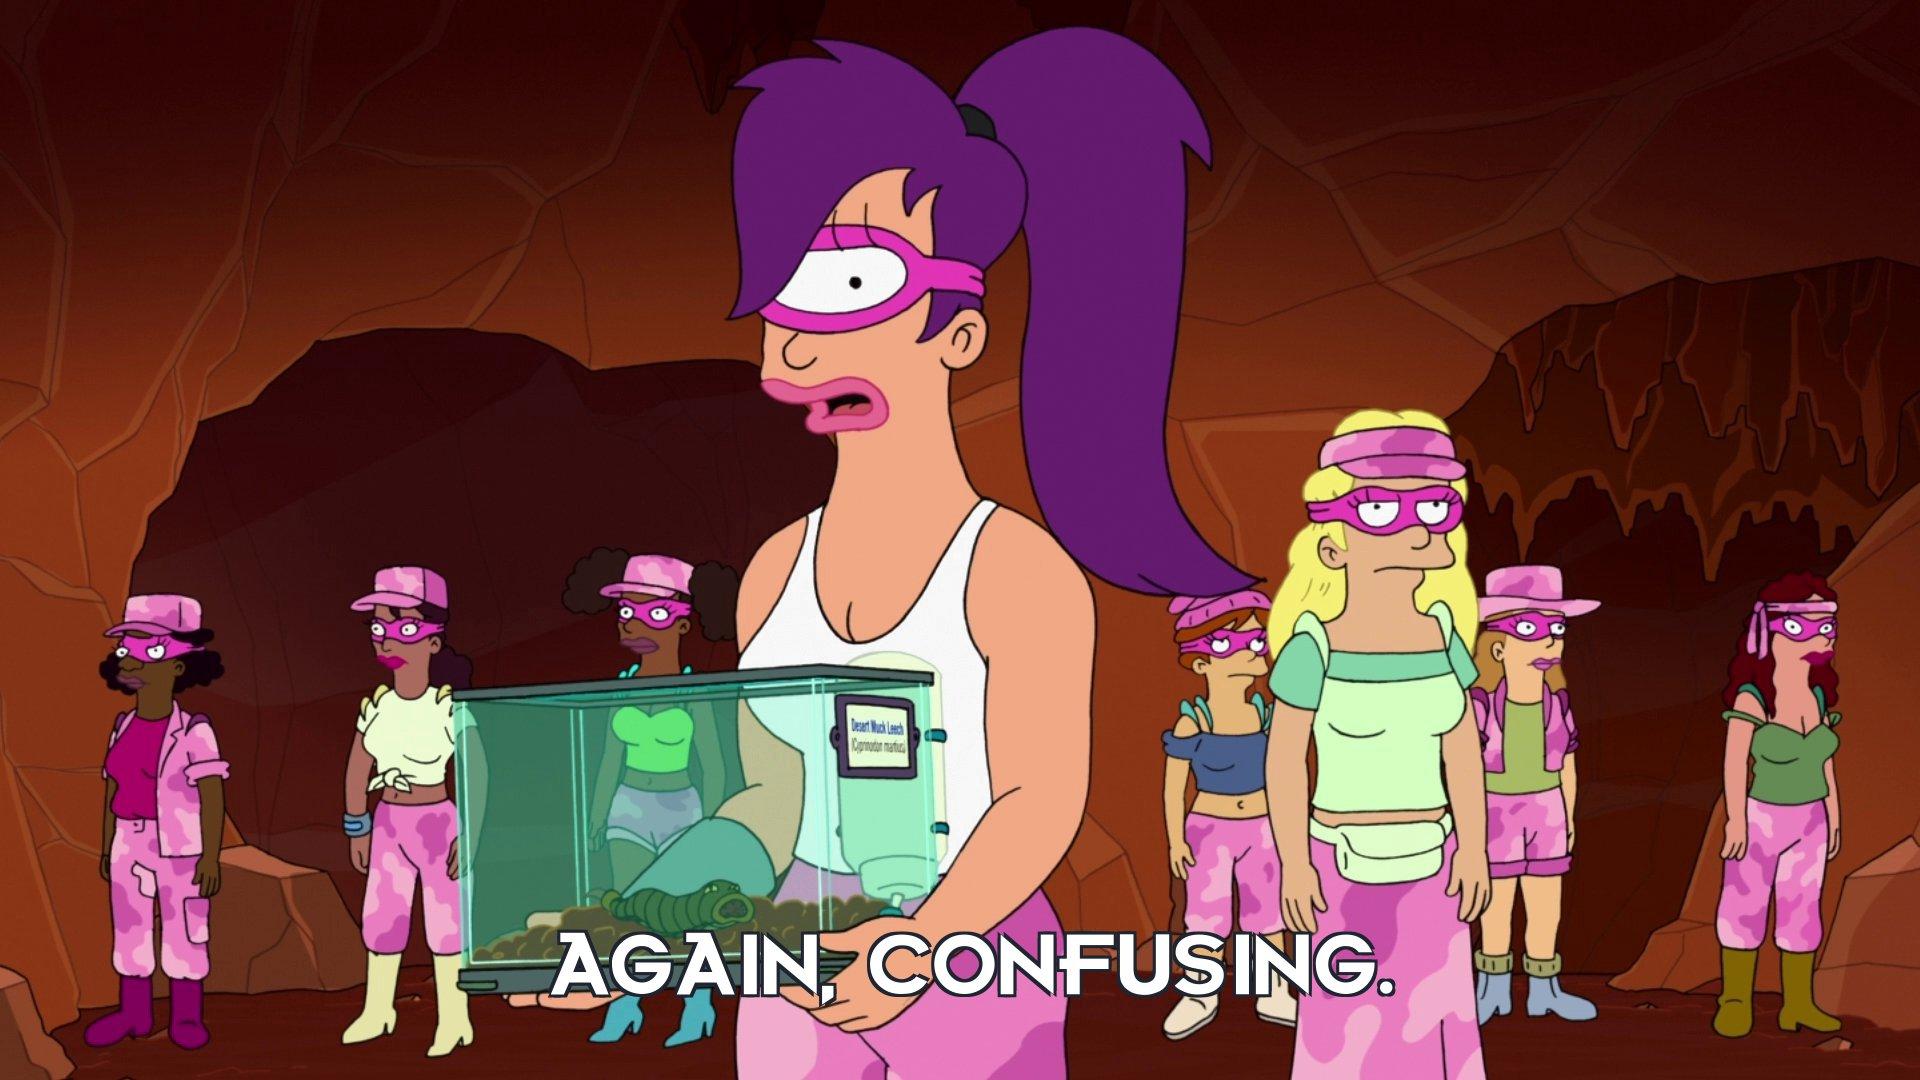 Turanga Leela: Again, confusing.